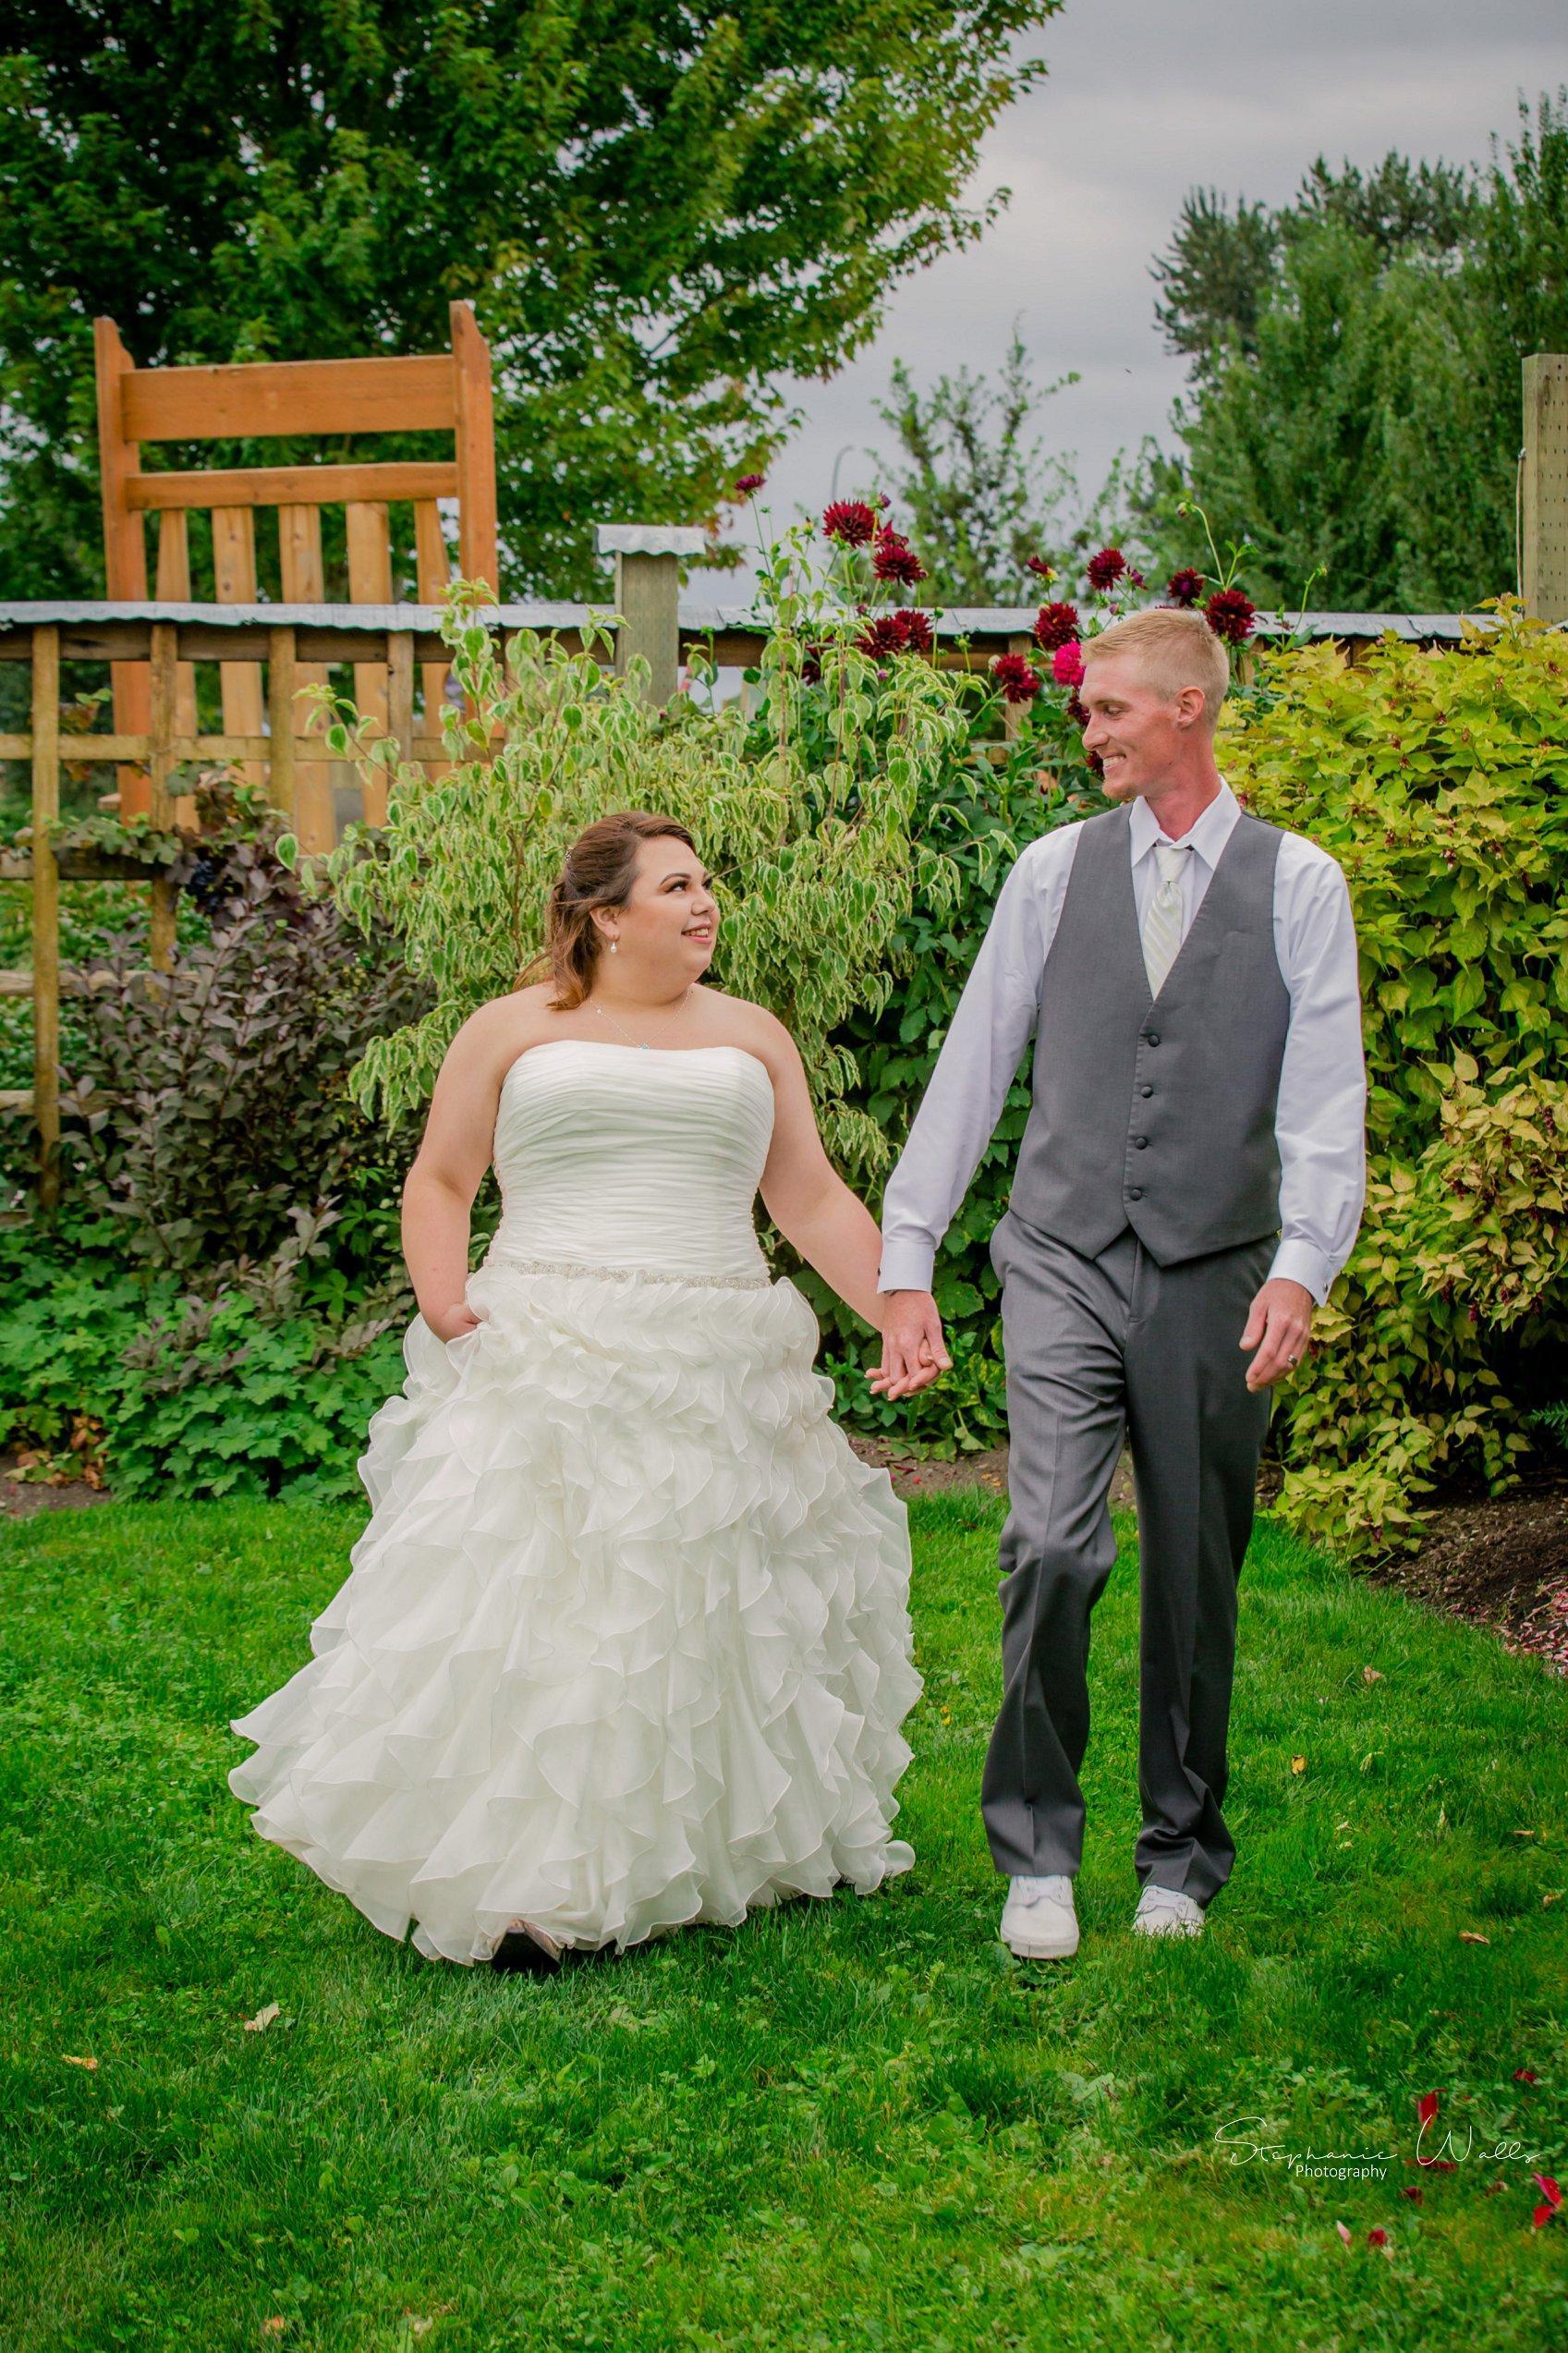 Kimble Wedding 122 Marlena & Allans | Snohomish Red Barn Events (Stocker Farms) | Snohomish, Wa Wedding Photographer